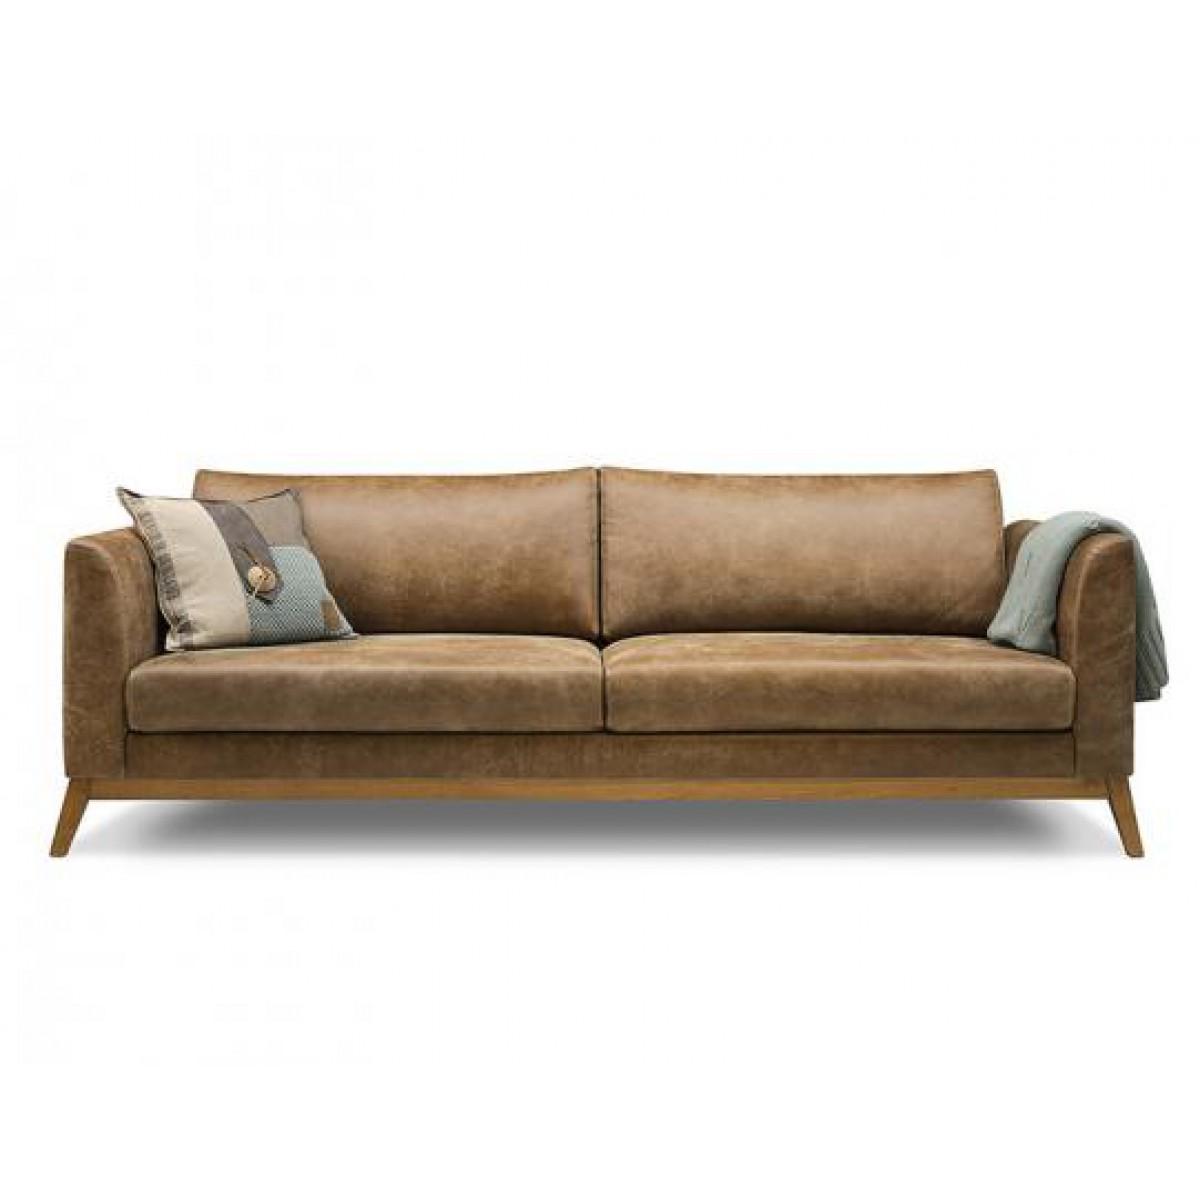 Designer Couch Leder Good Designer Sofa Leder Zermatt Live Design